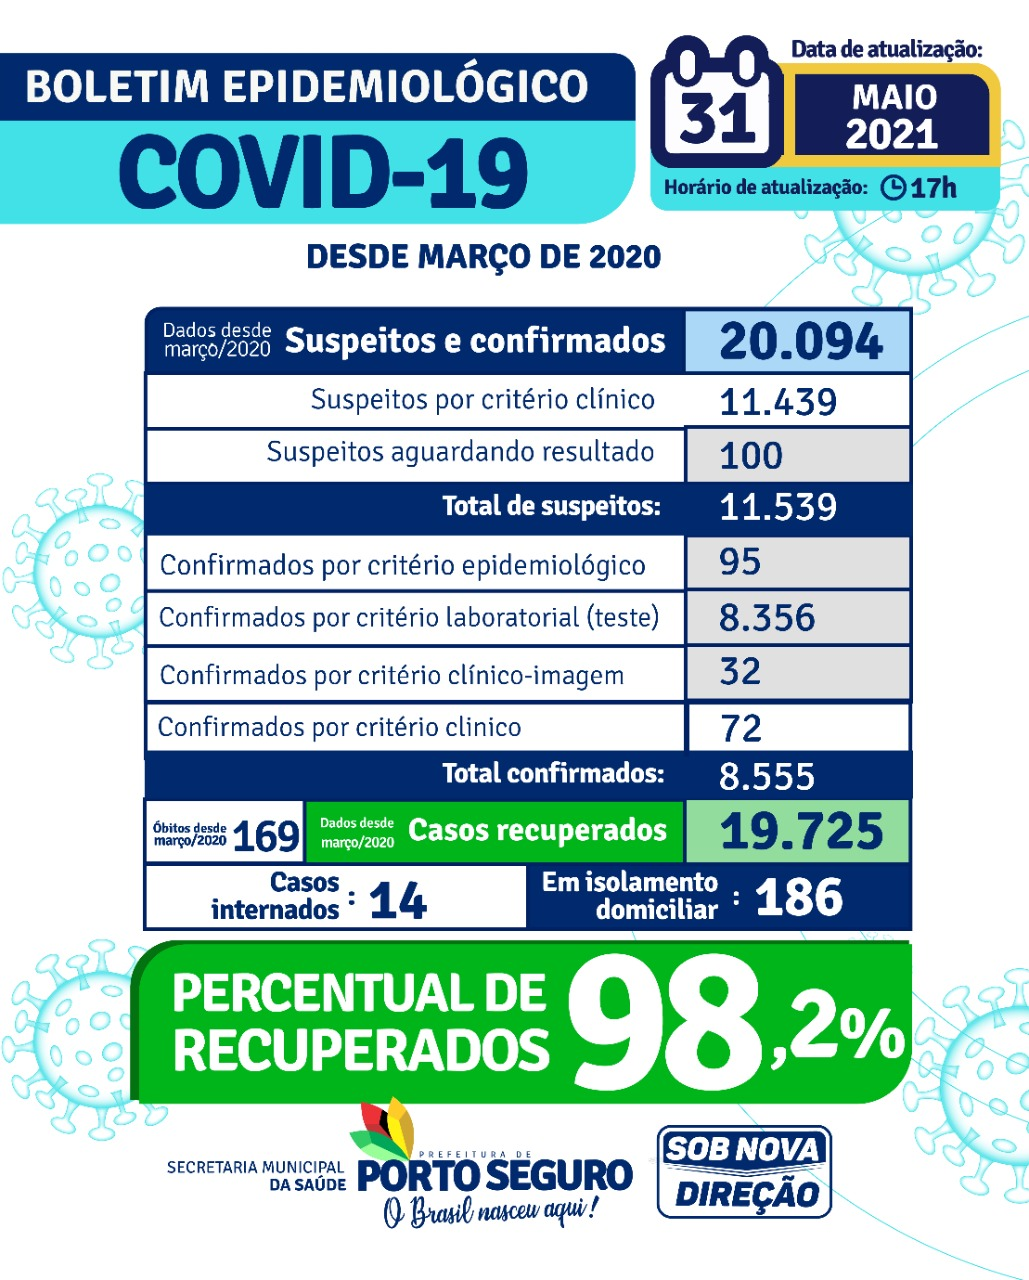 Porto Seguro: Boletim Epidemiológico Covid-19 (31/Maio) 24